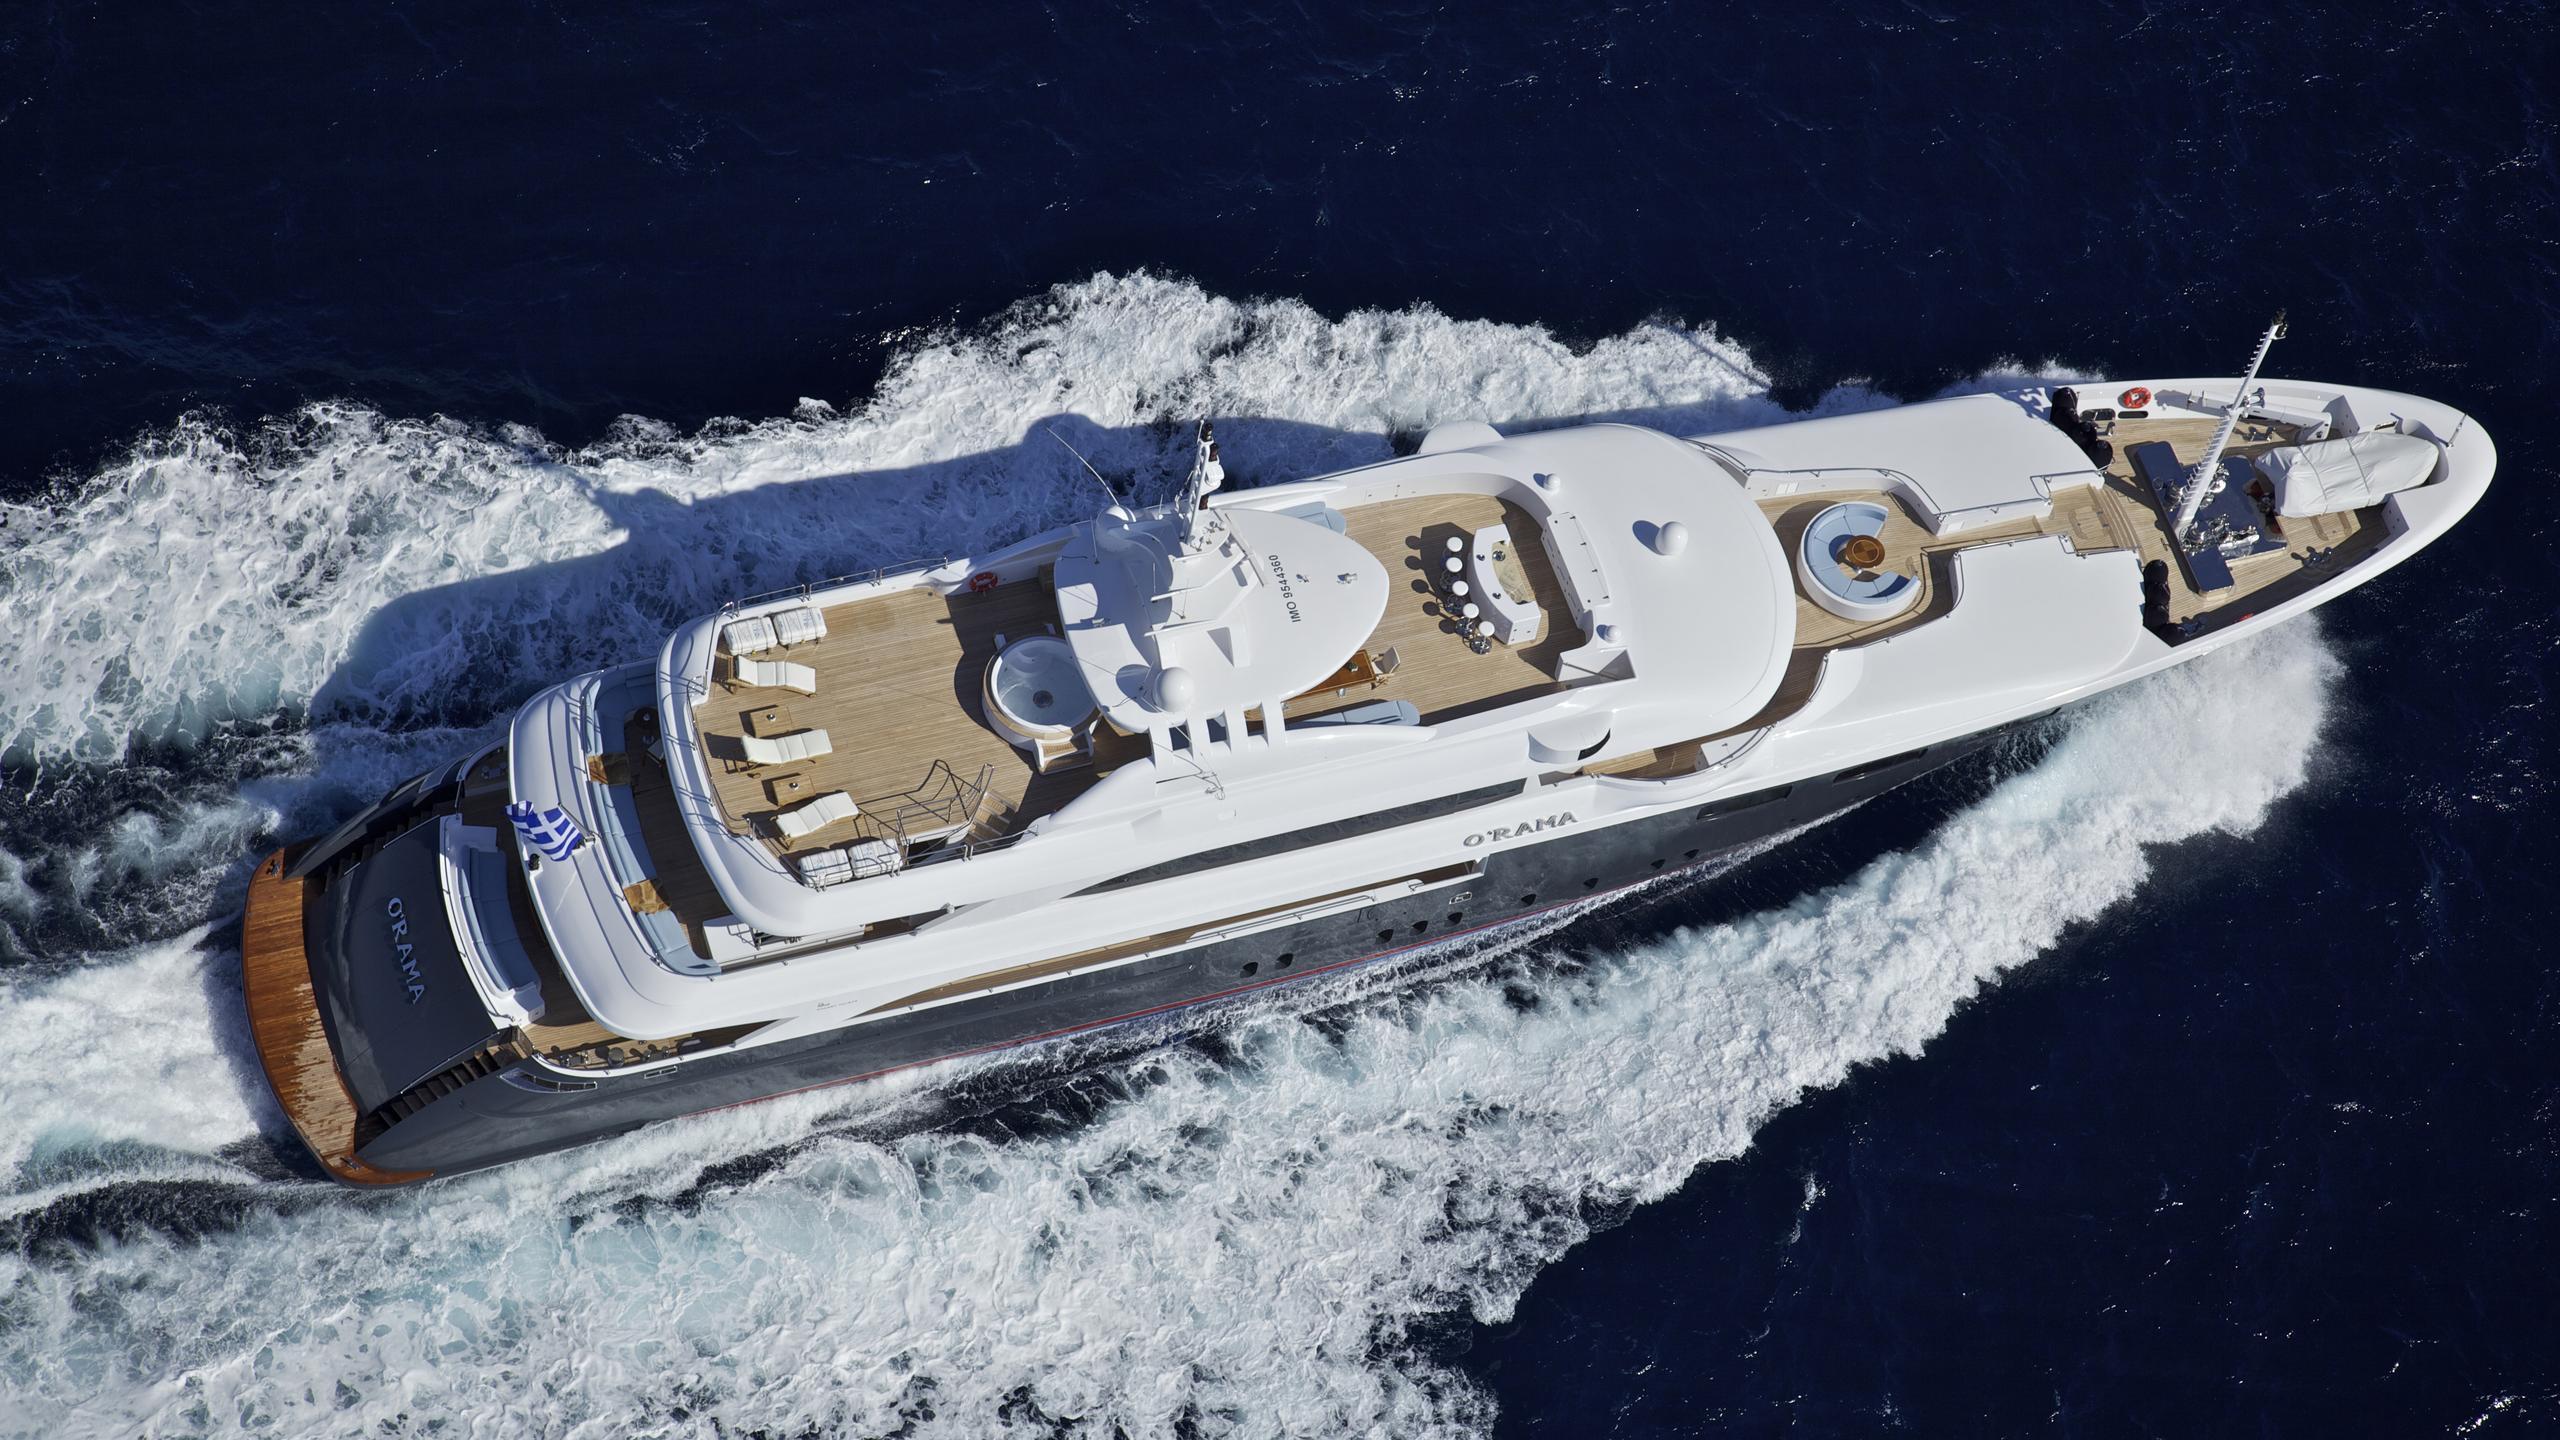 o'rama-yacht-aerial